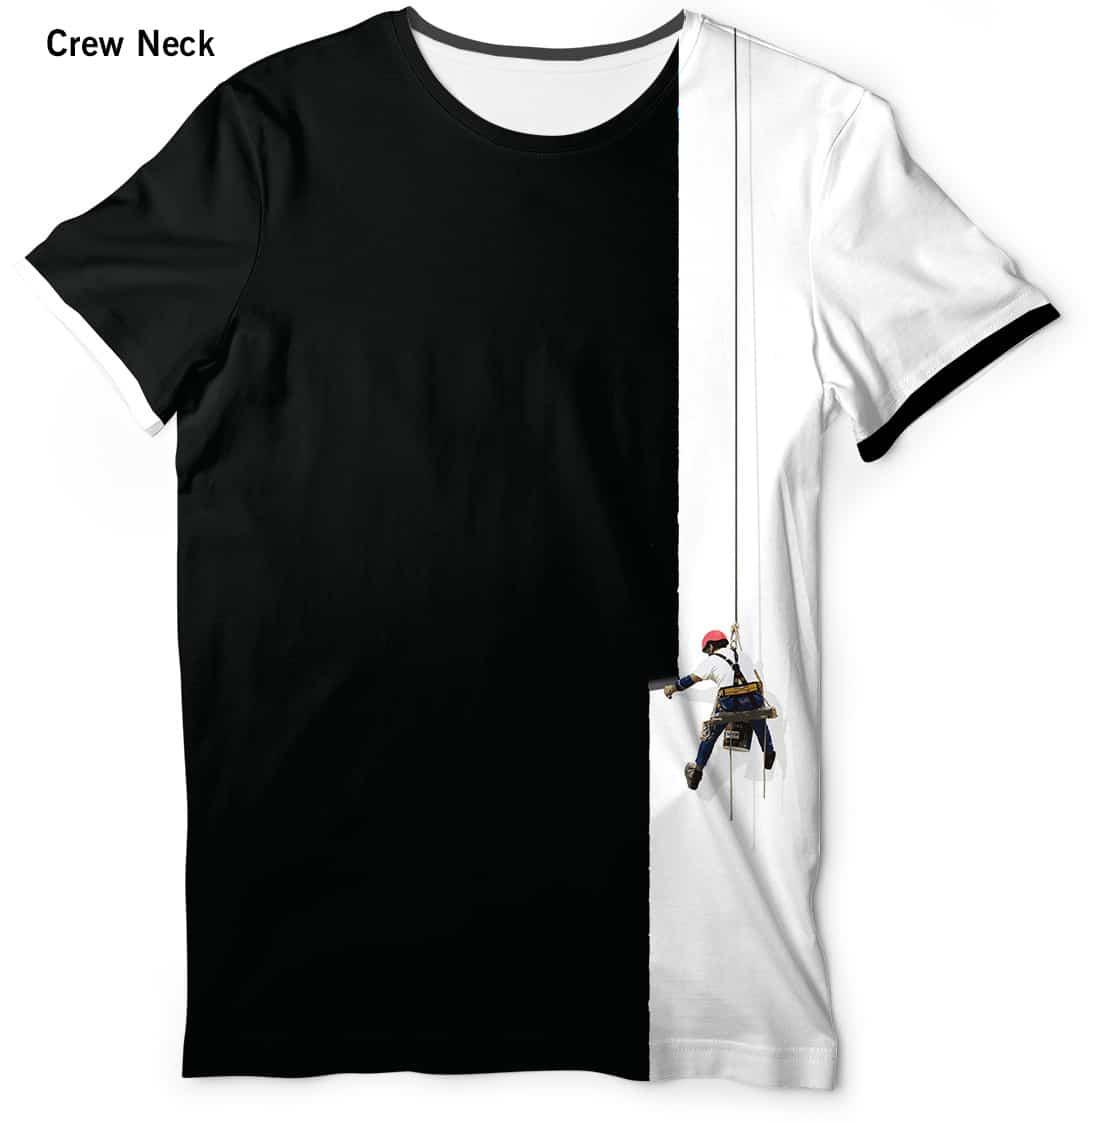 Creative painter t shirt men 39 s short sleeve designed for T shirt creative design